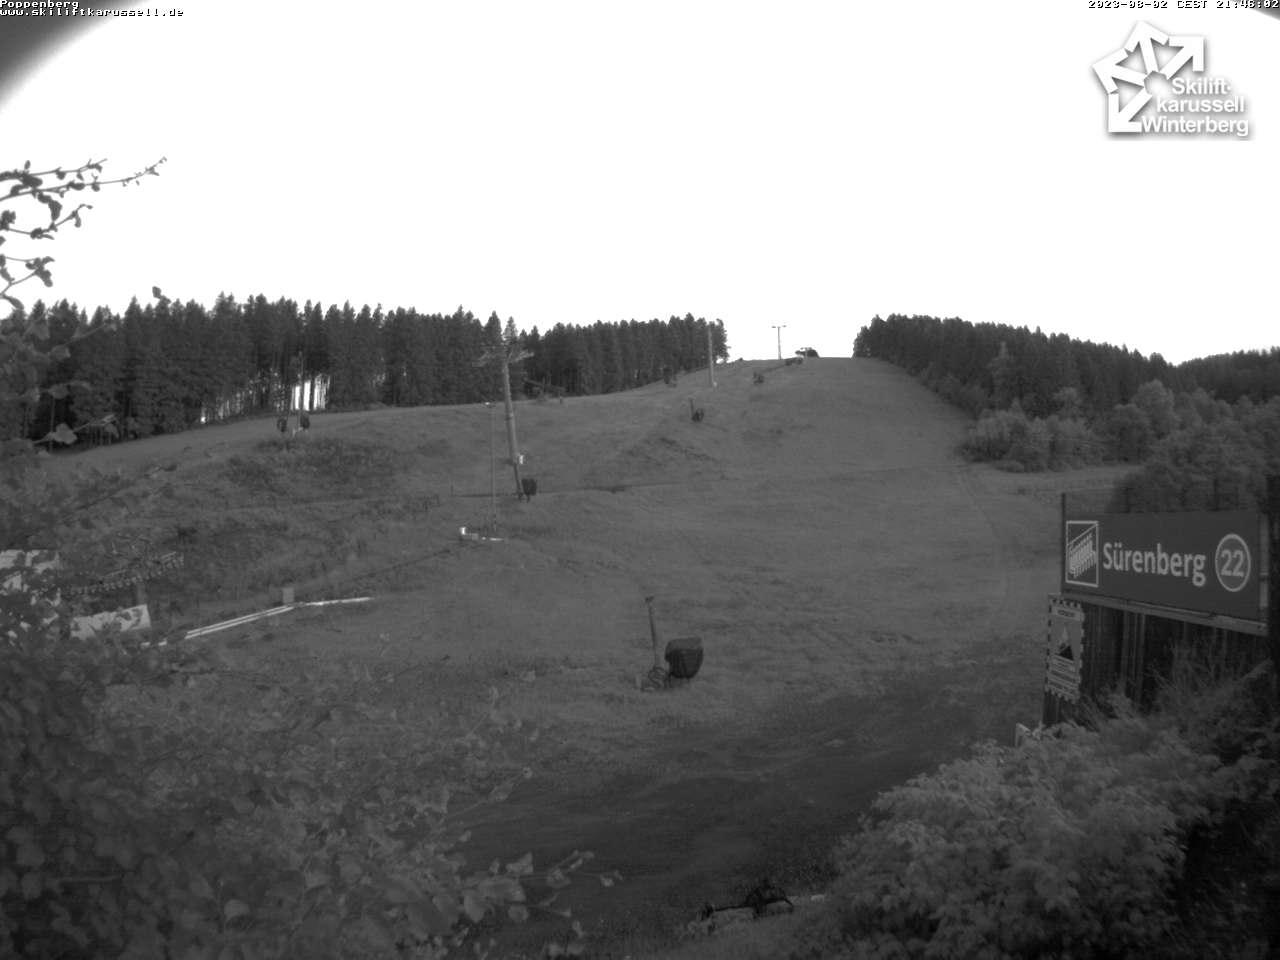 Webcam Skigebiet Winterberg Poppenberg - Sauerland